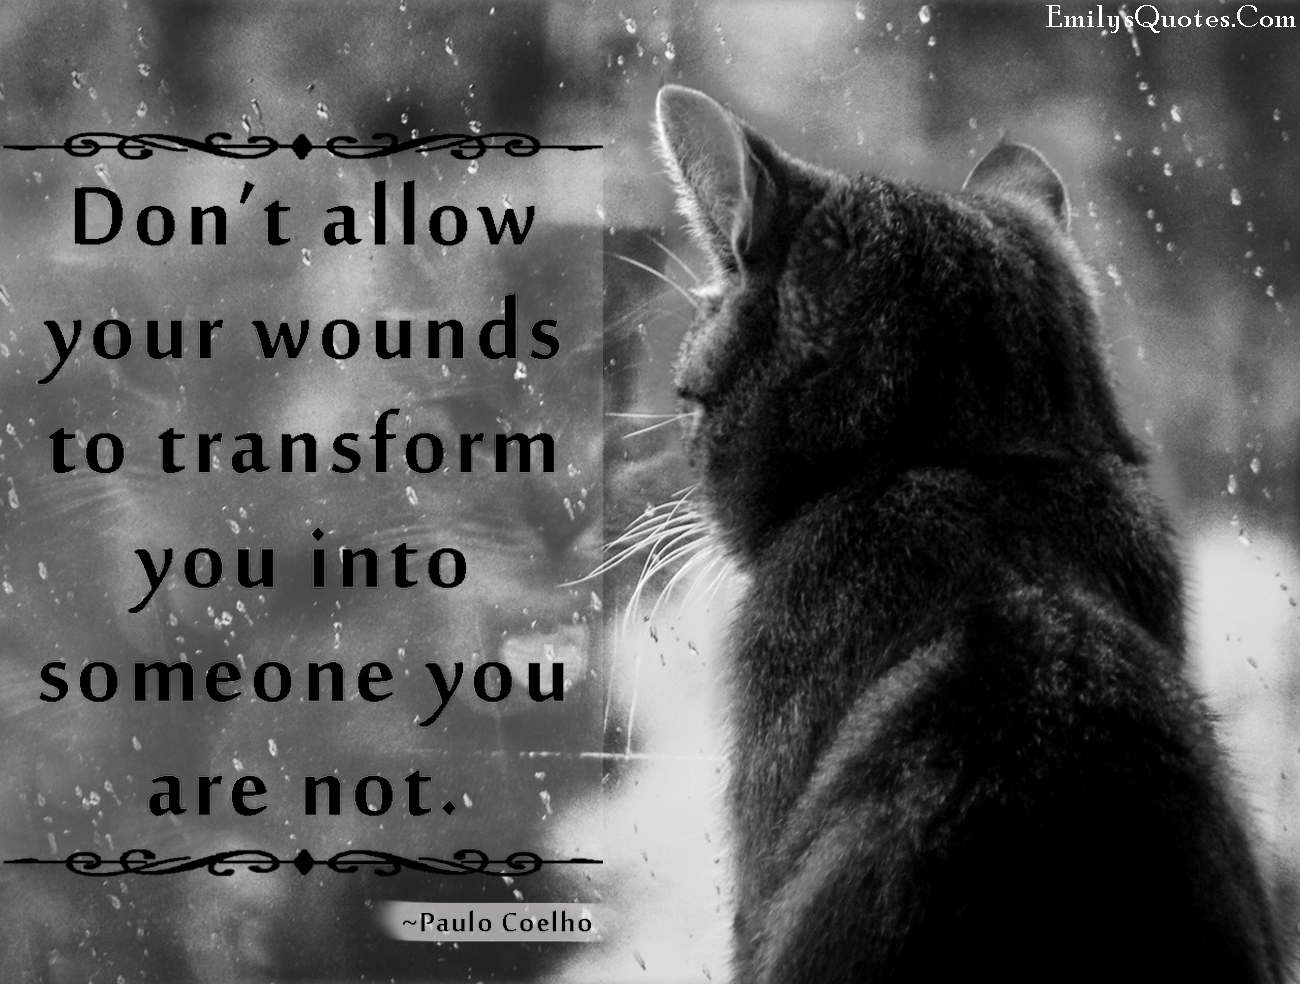 EmilysQuotes.Com - wounds, pain, hurt, change, transform, be yourself, Paulo Coelho